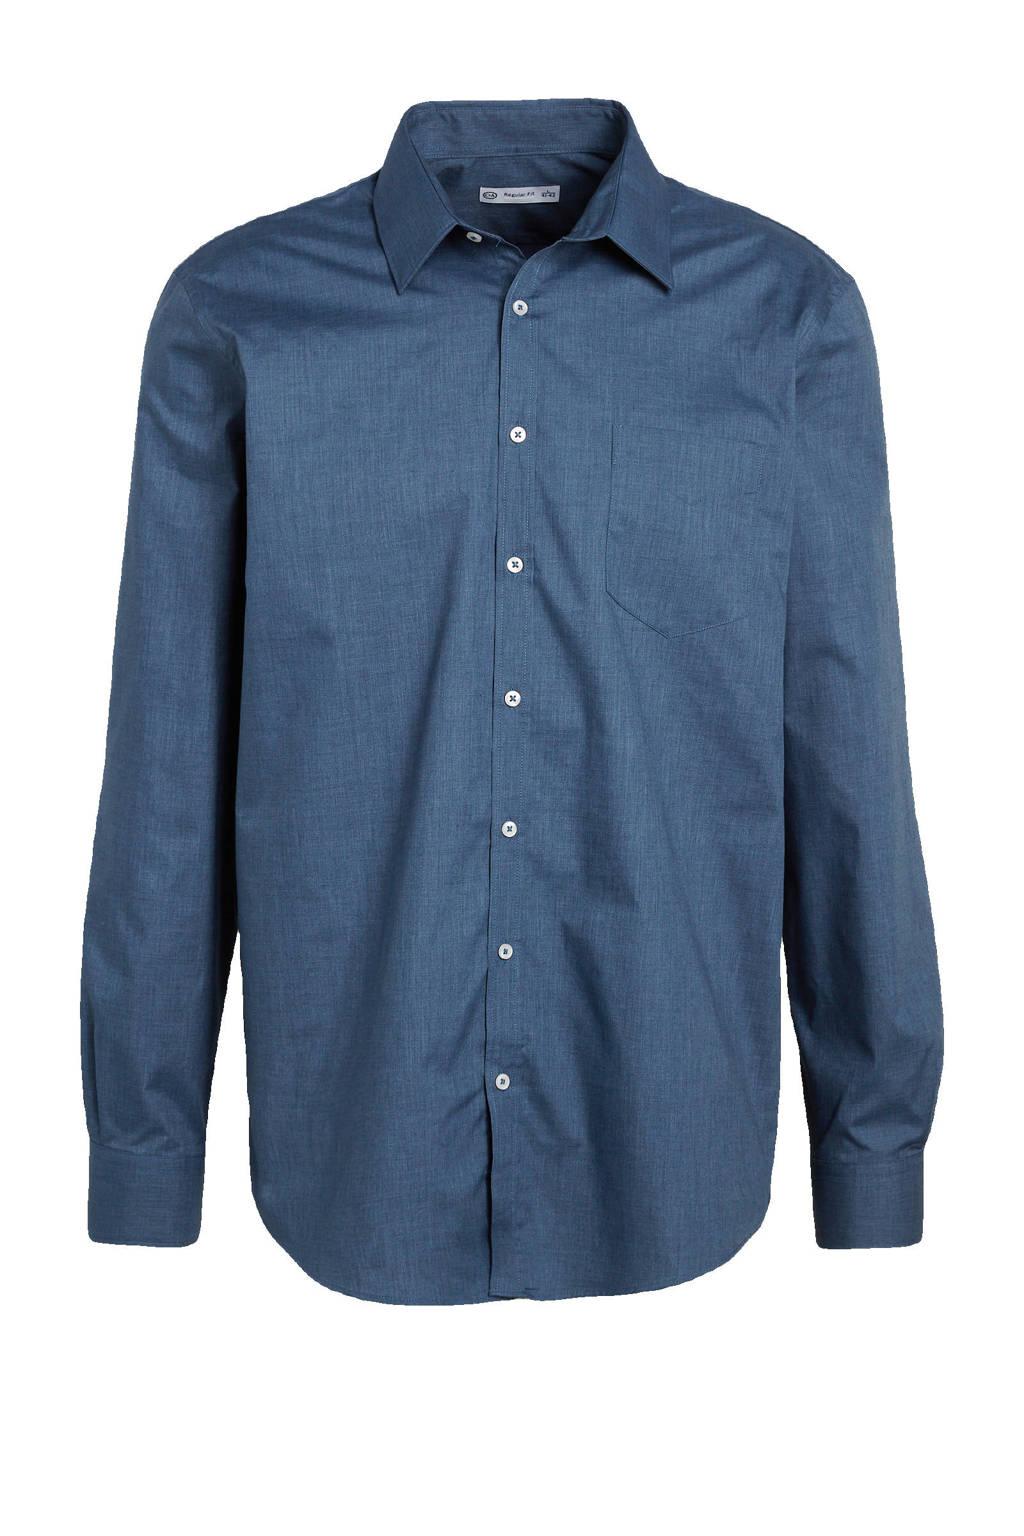 C&A Angelo Litrico regular fit overhemd blauw, Blauw